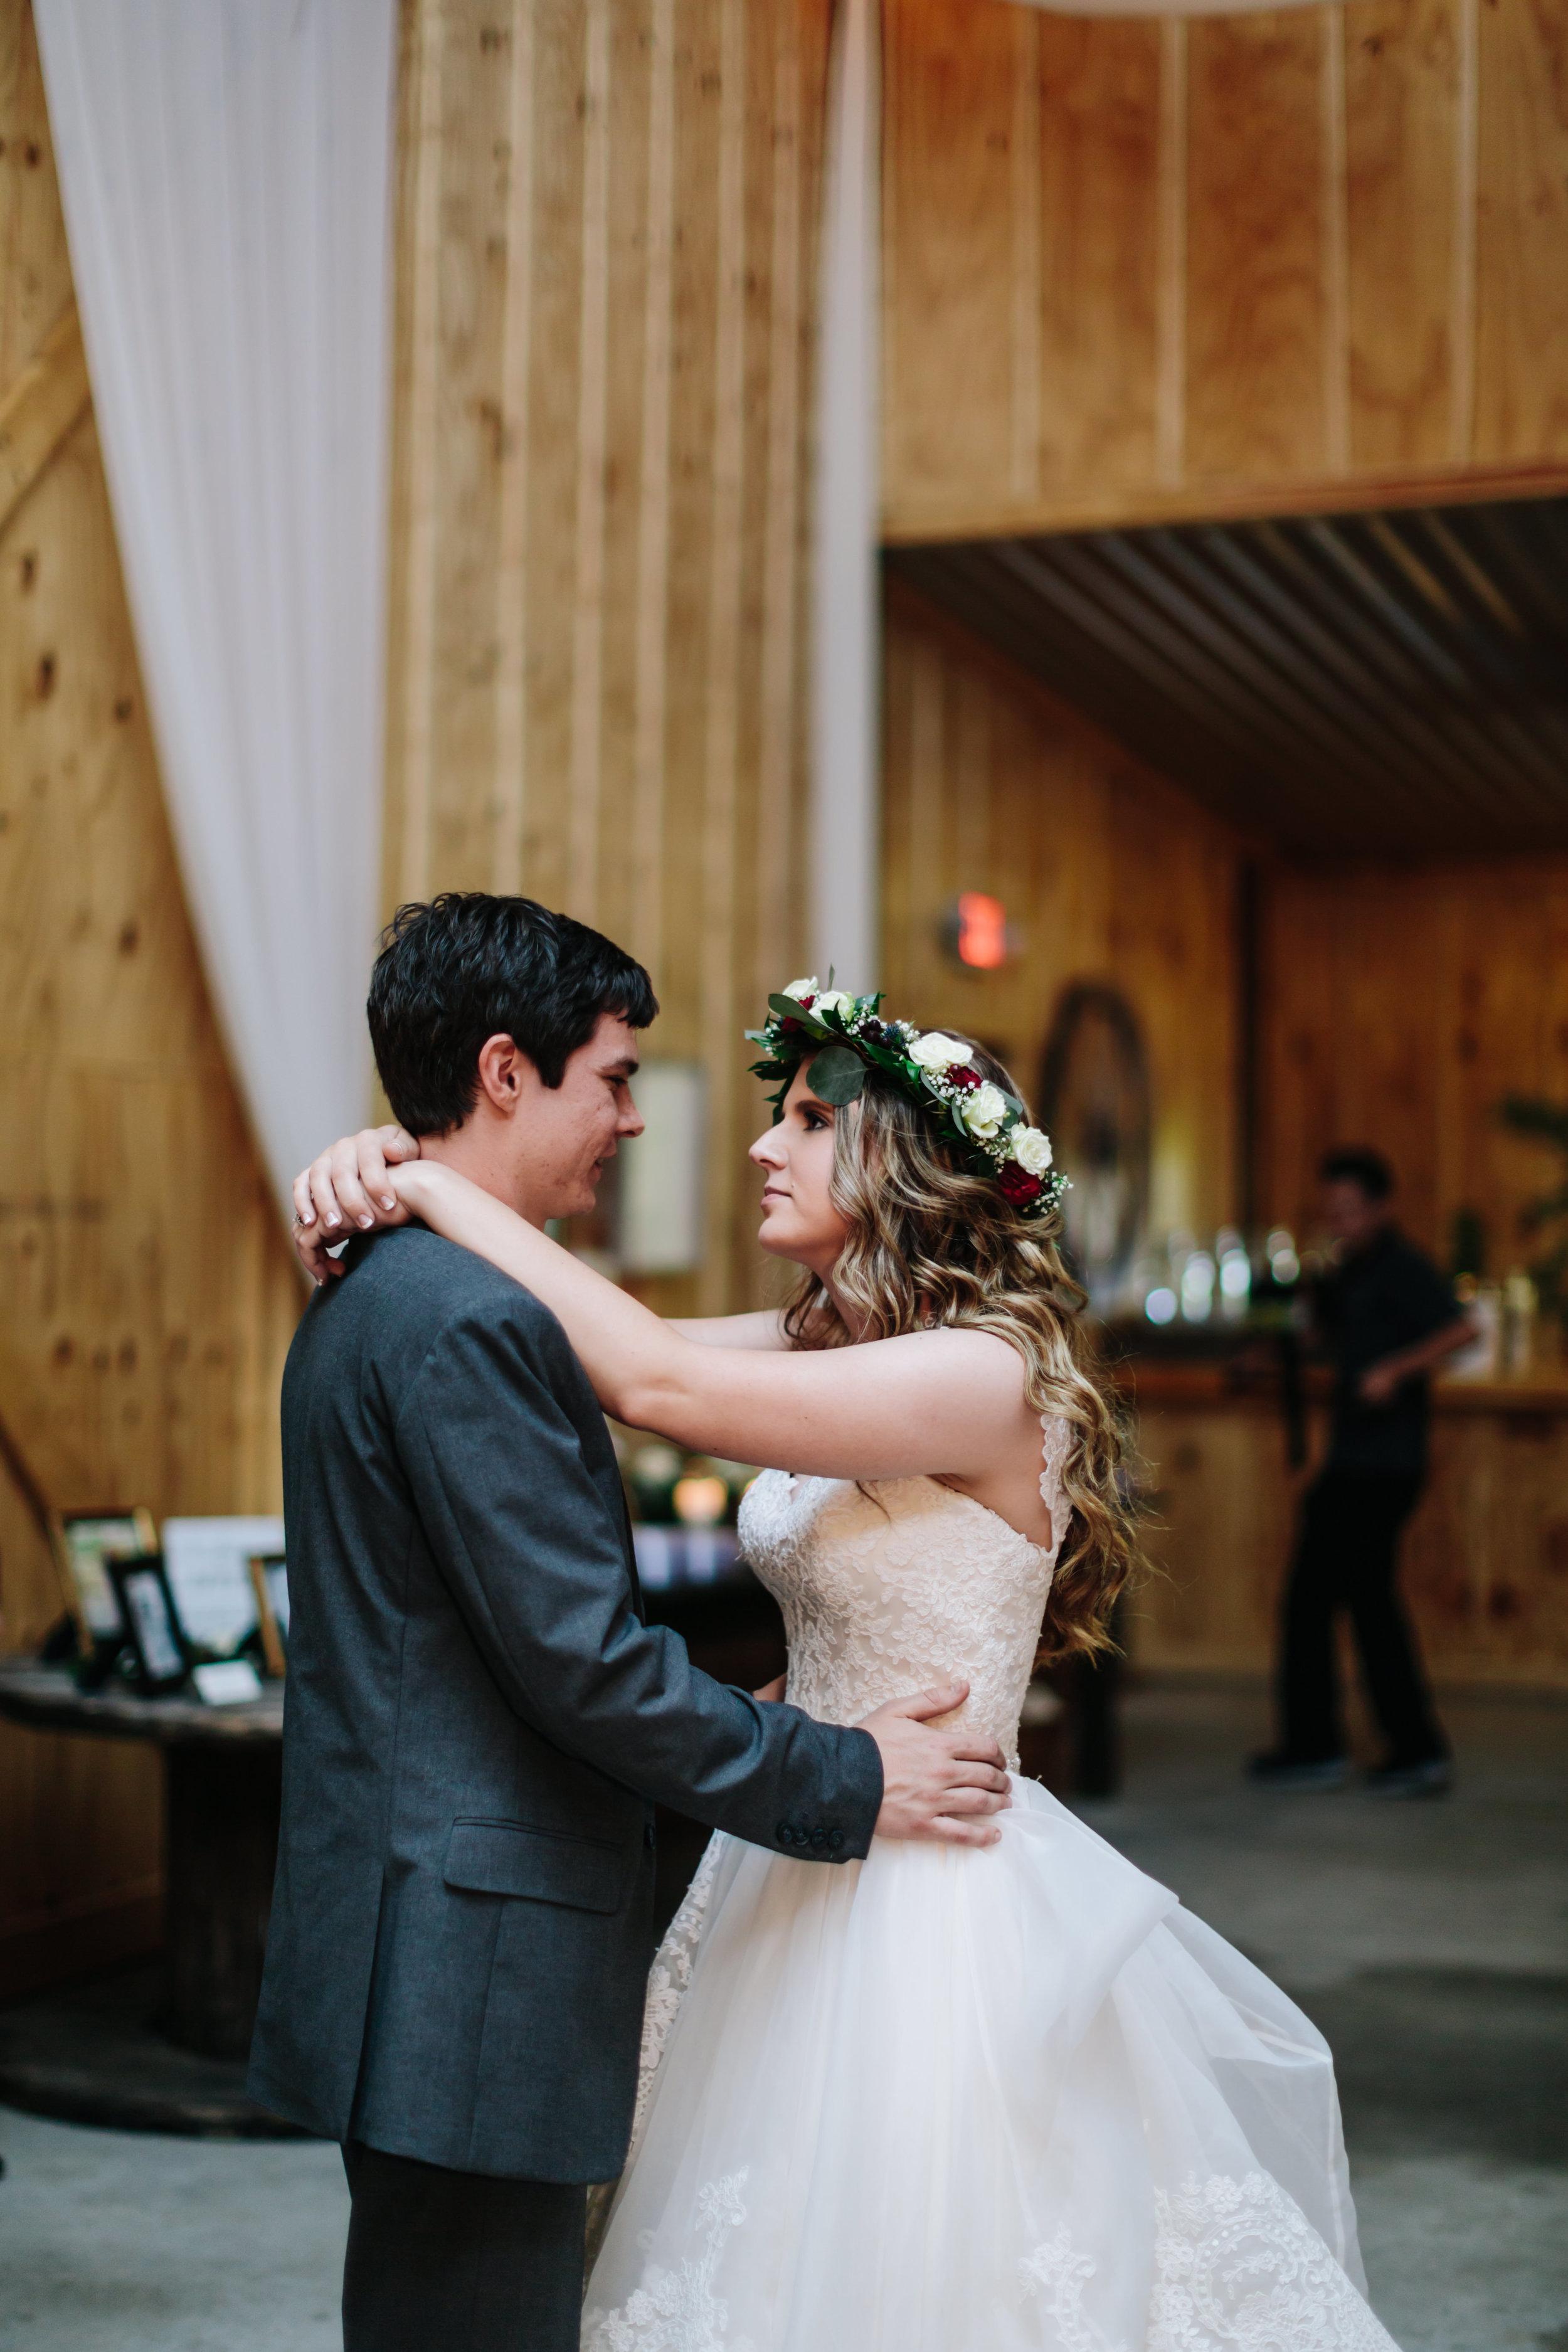 2018.04.14 Zak and Jamisyn Unrue Black Willow Barn Wedding Finals-633.jpg